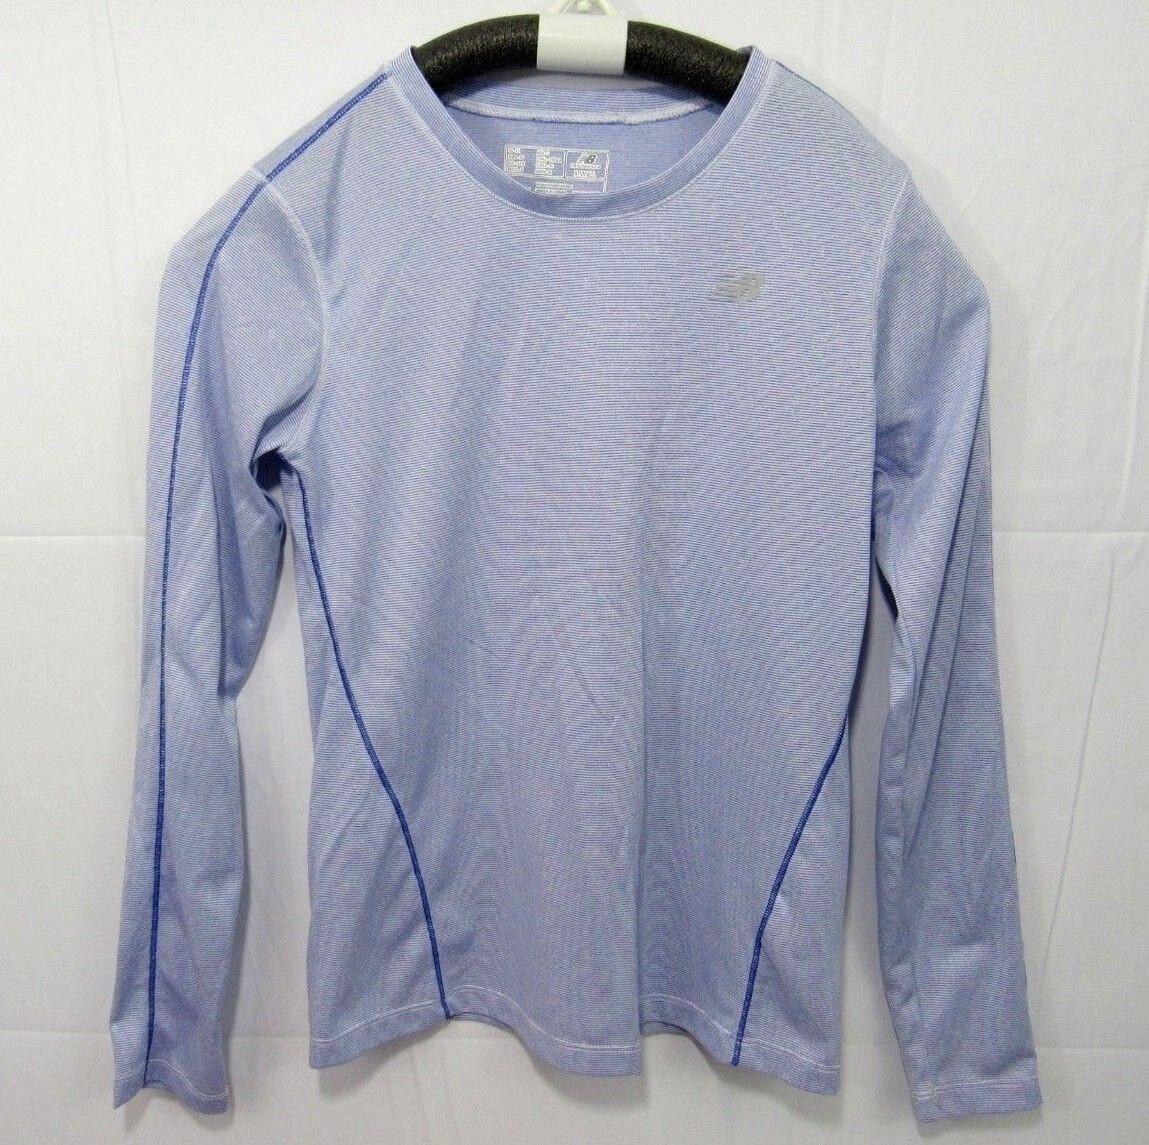 New Balance Womens Purple/Blue Athletic Shirt Lightning Dry XS